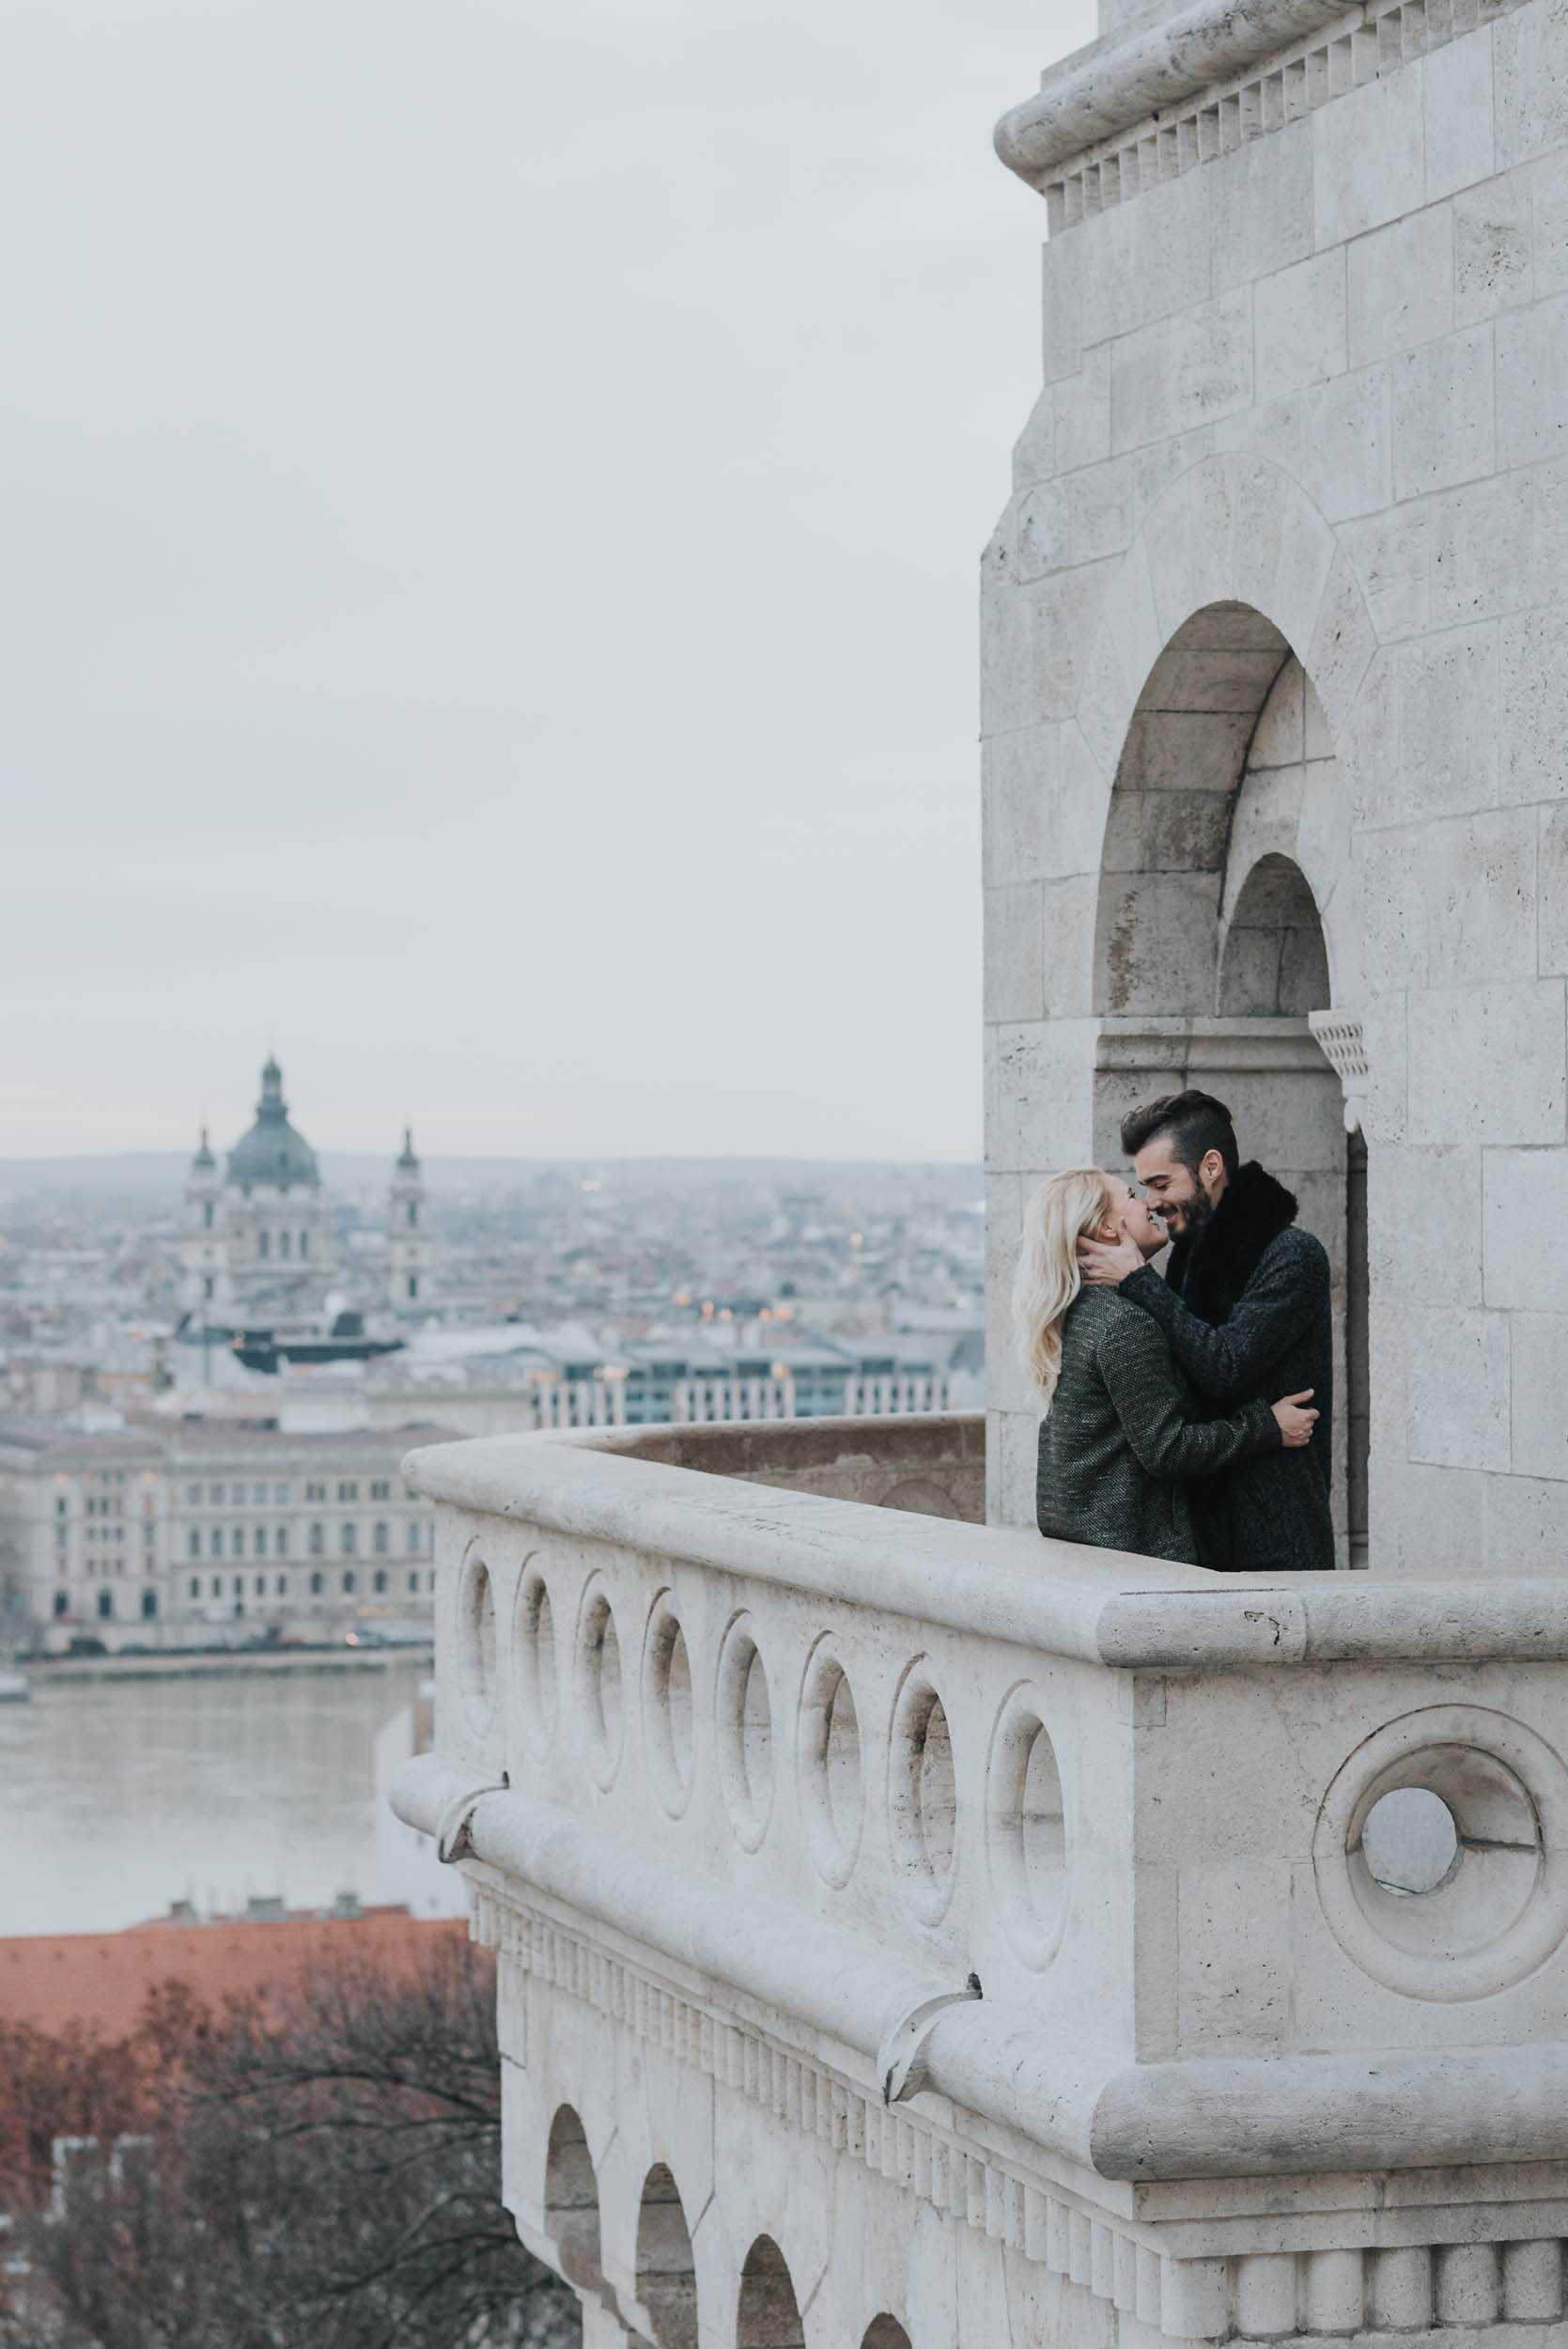 Budapest portrait photographer at Fisherman's Bastion